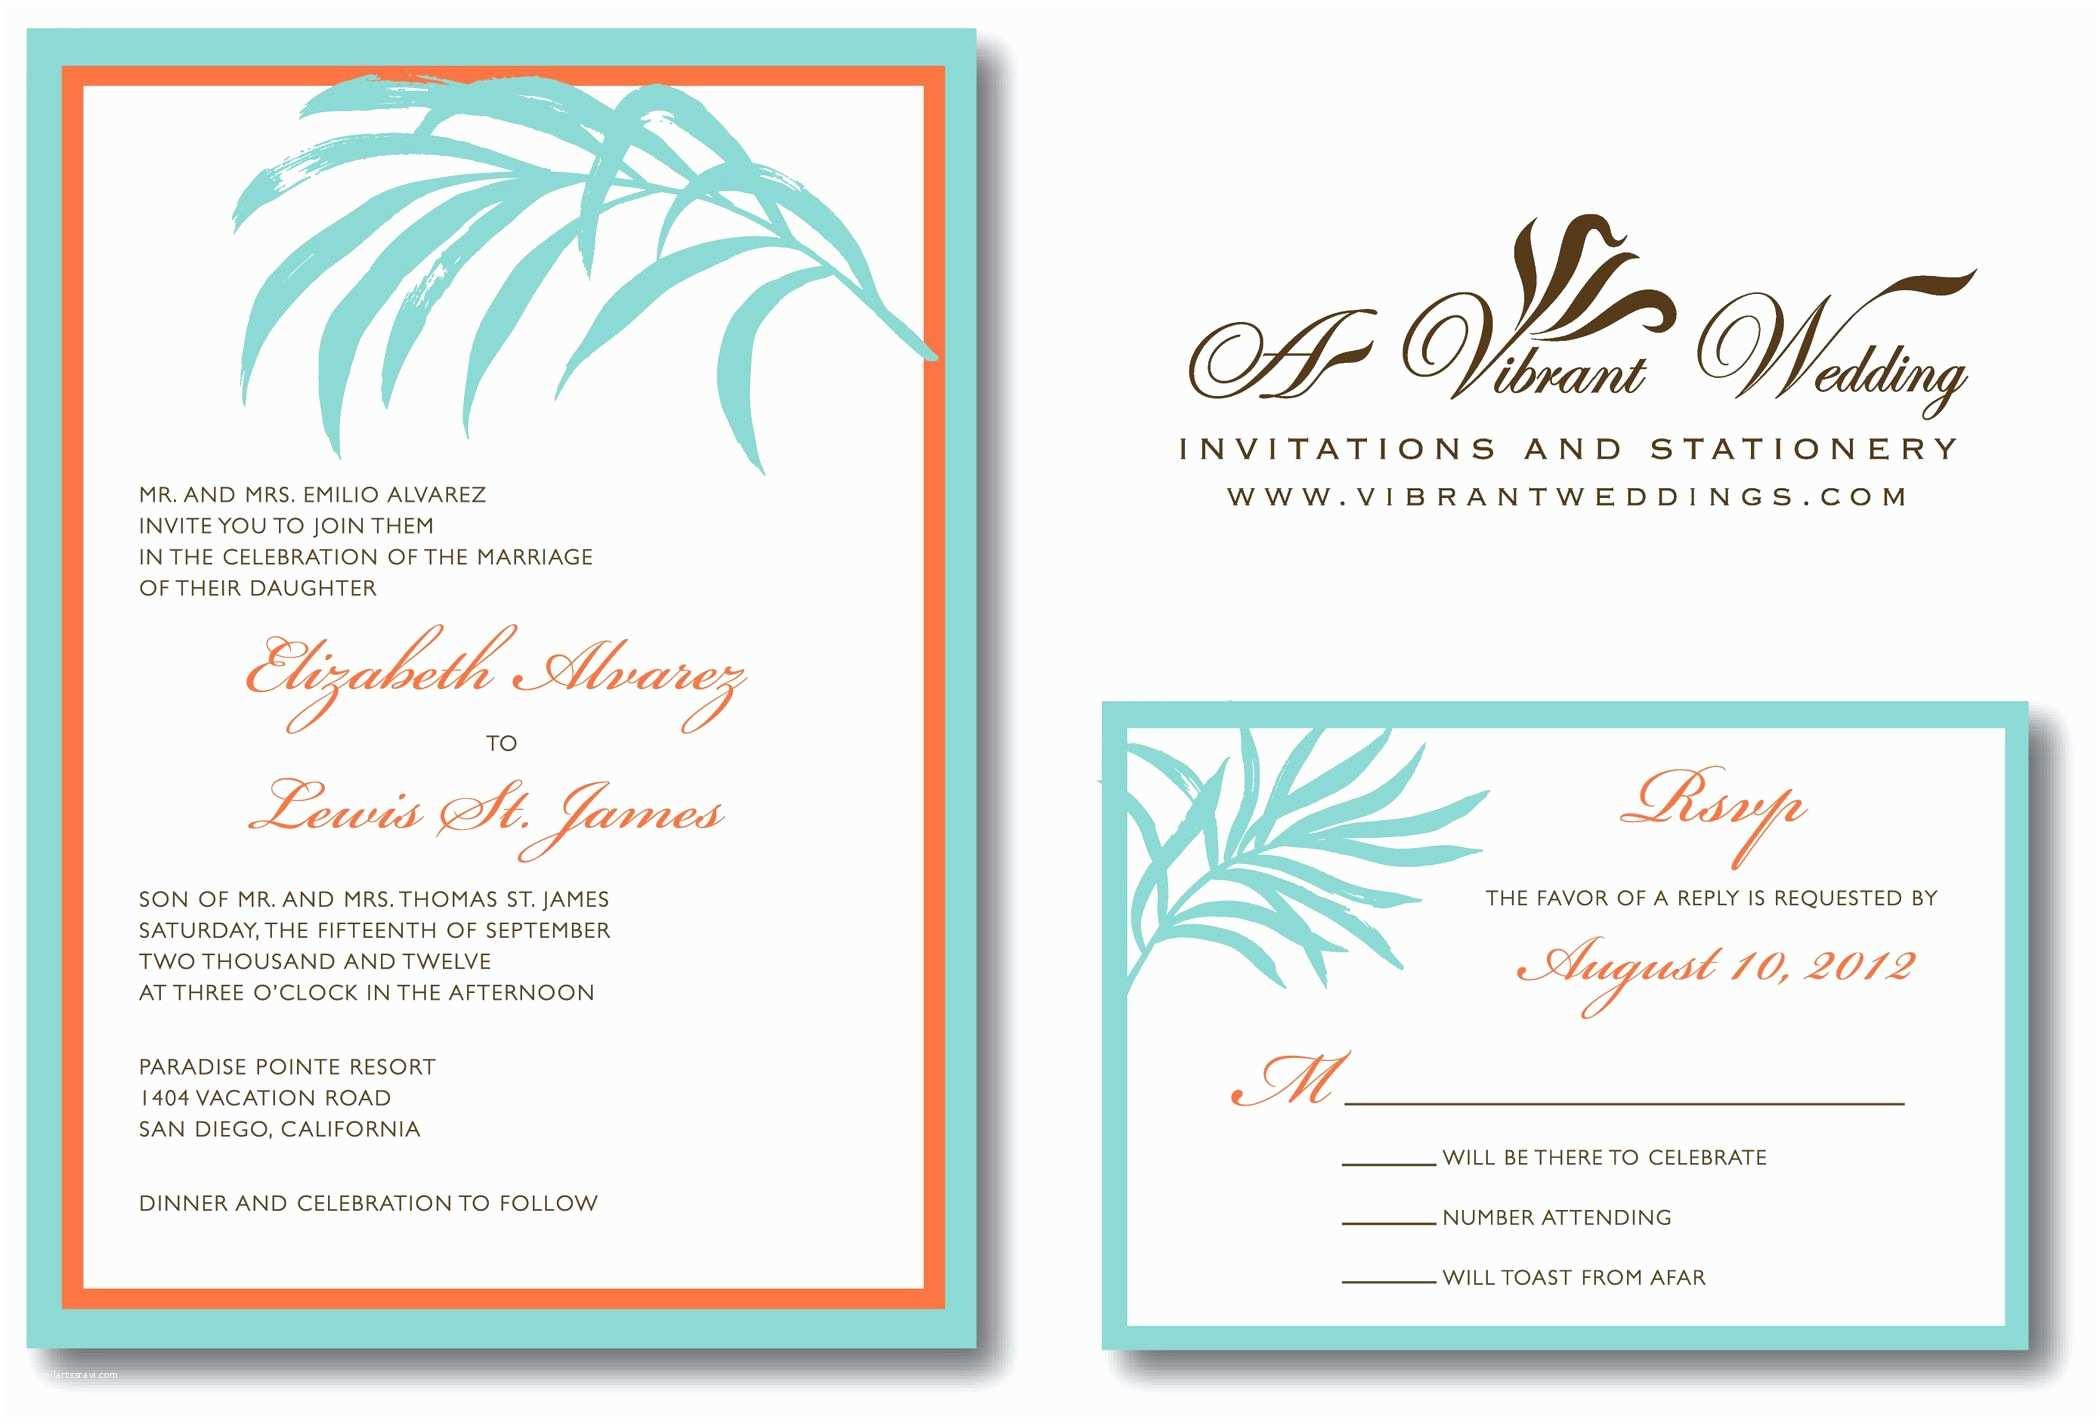 Wedding Invitation Wording Templates Beach Wedding Invitations Wording Beach Wedding